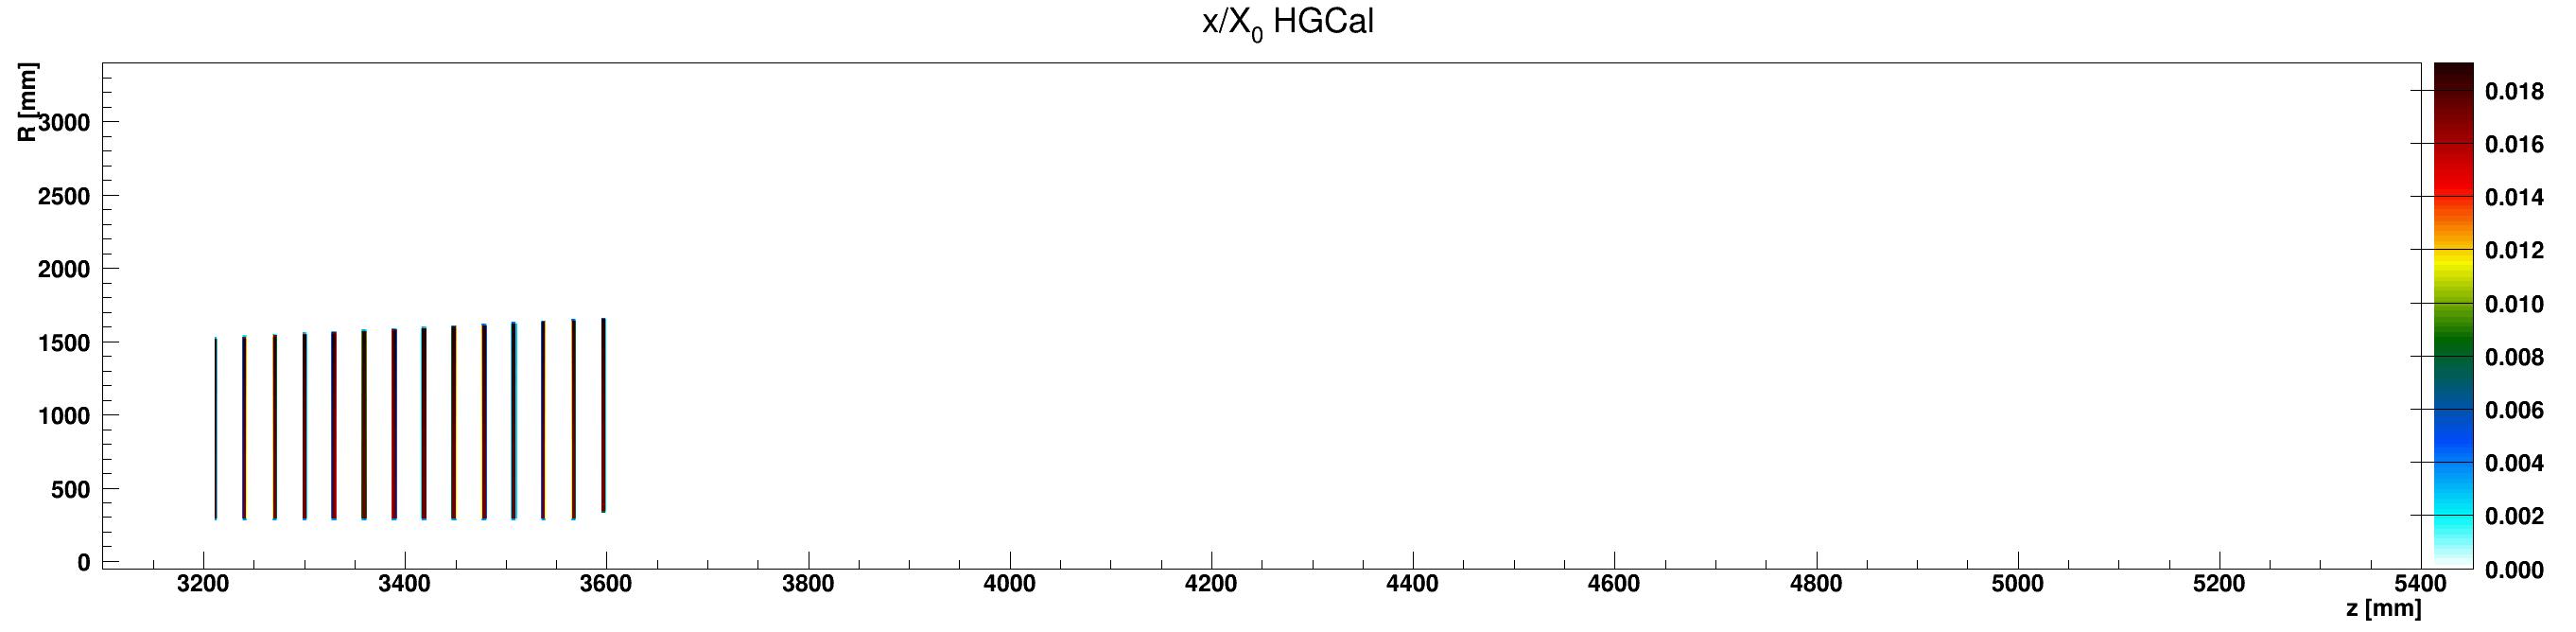 HGCal_x_vs_z_vs_RlocLead_ZplusZoom.png